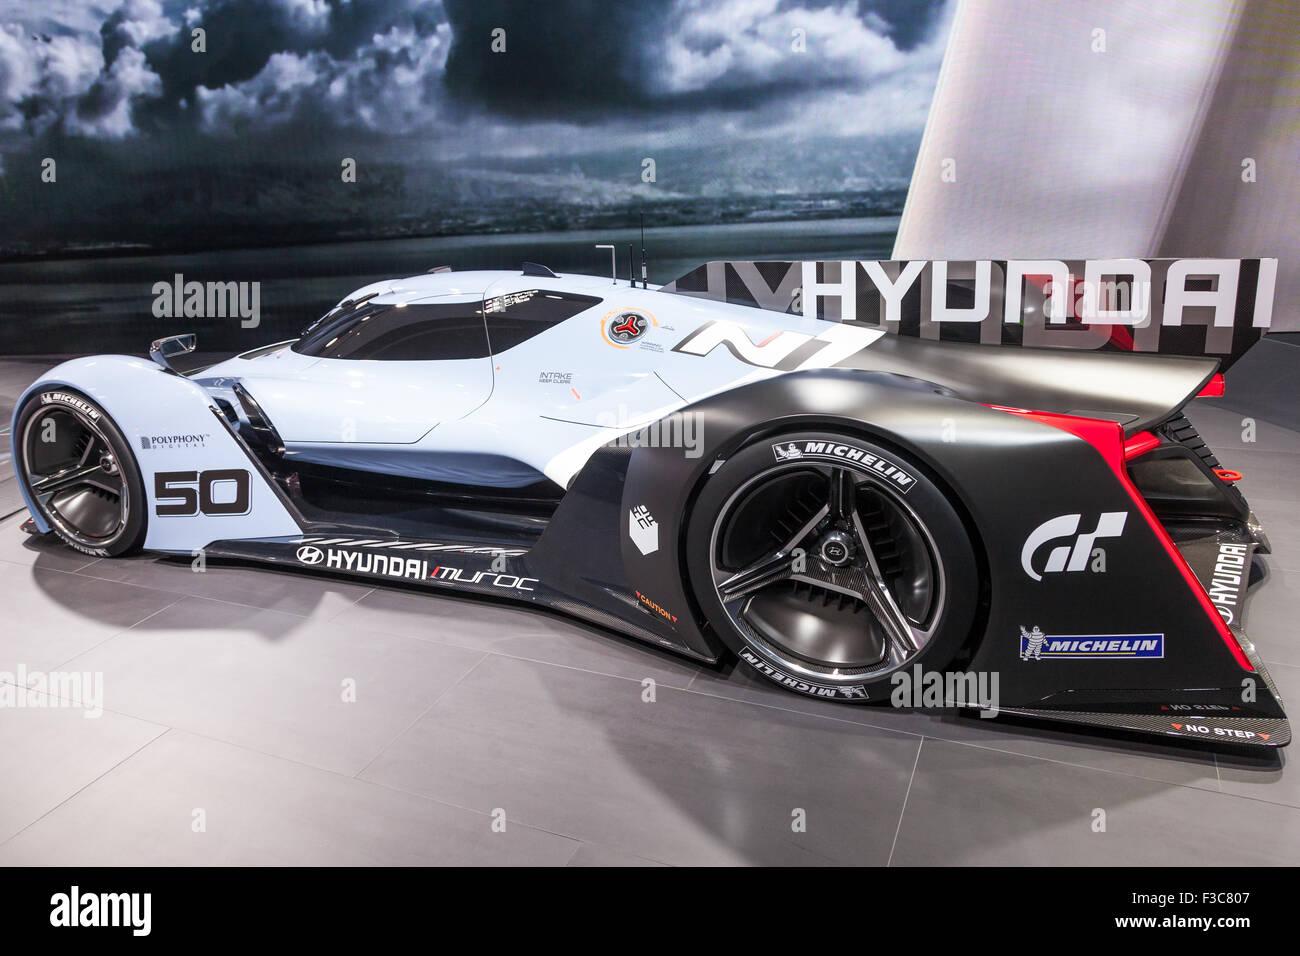 Hyundai Muroc Gran Turismo Super Car al IAA International Motor Show 2015 Immagini Stock